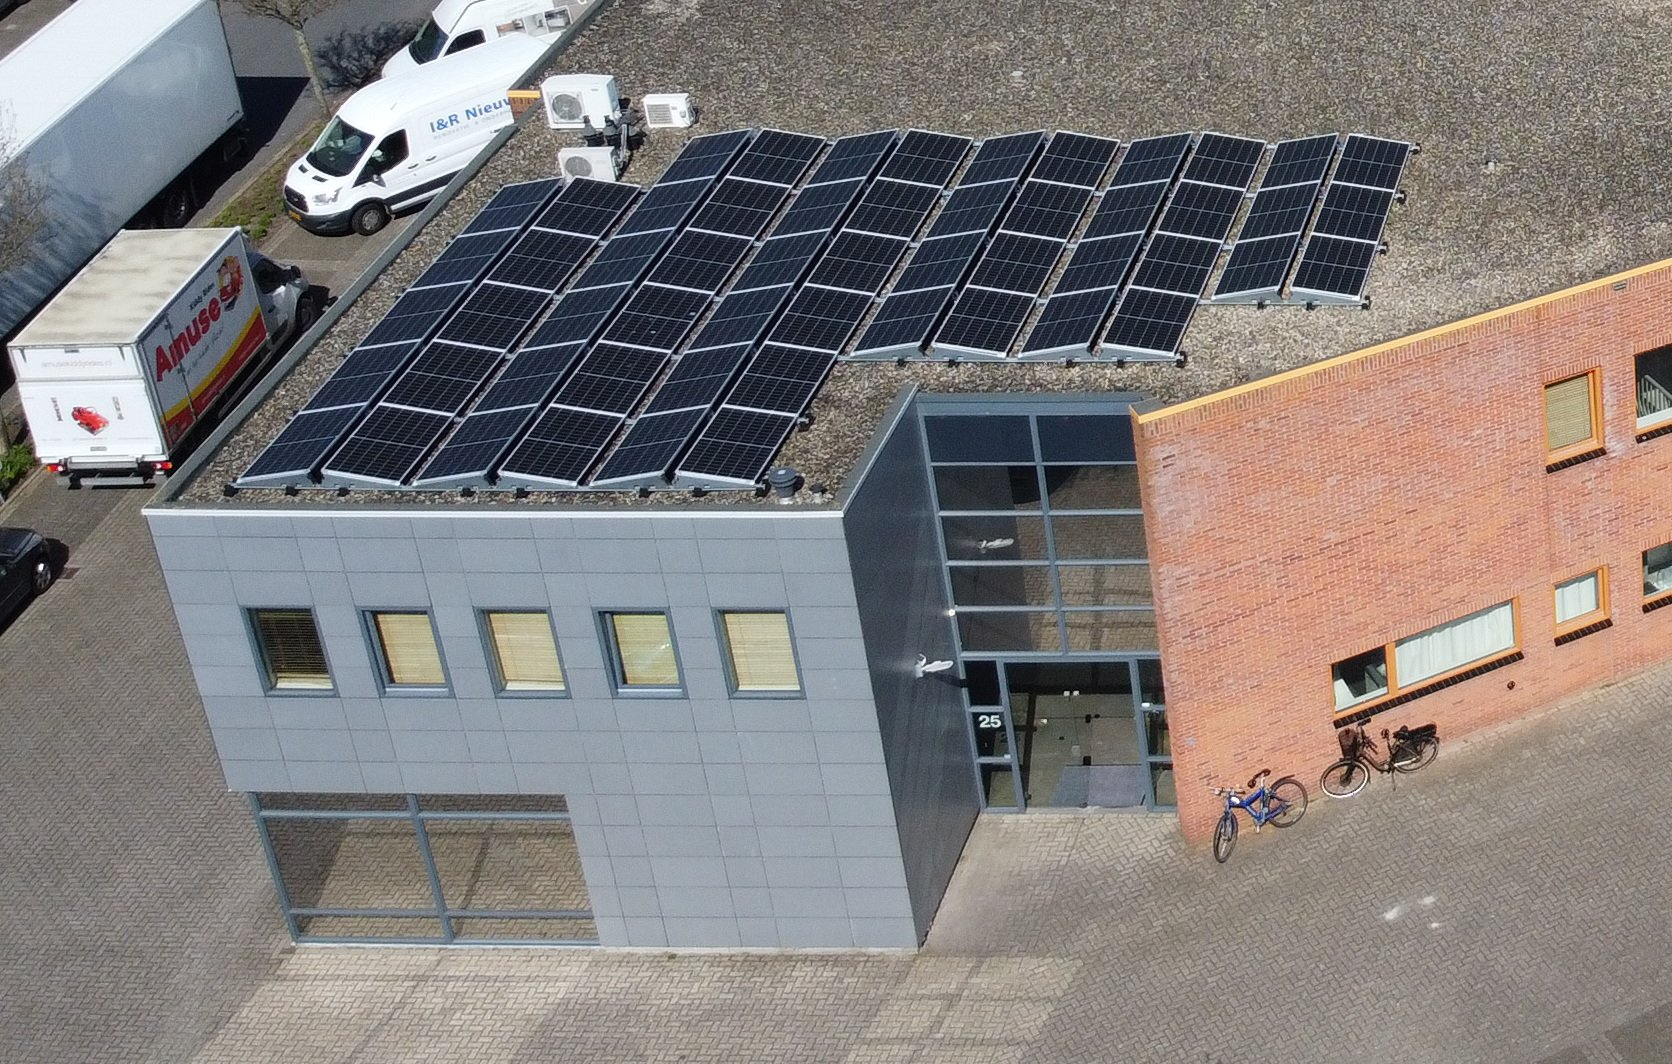 adesign-56-zonnepanelen-solarwatt-glas-folie